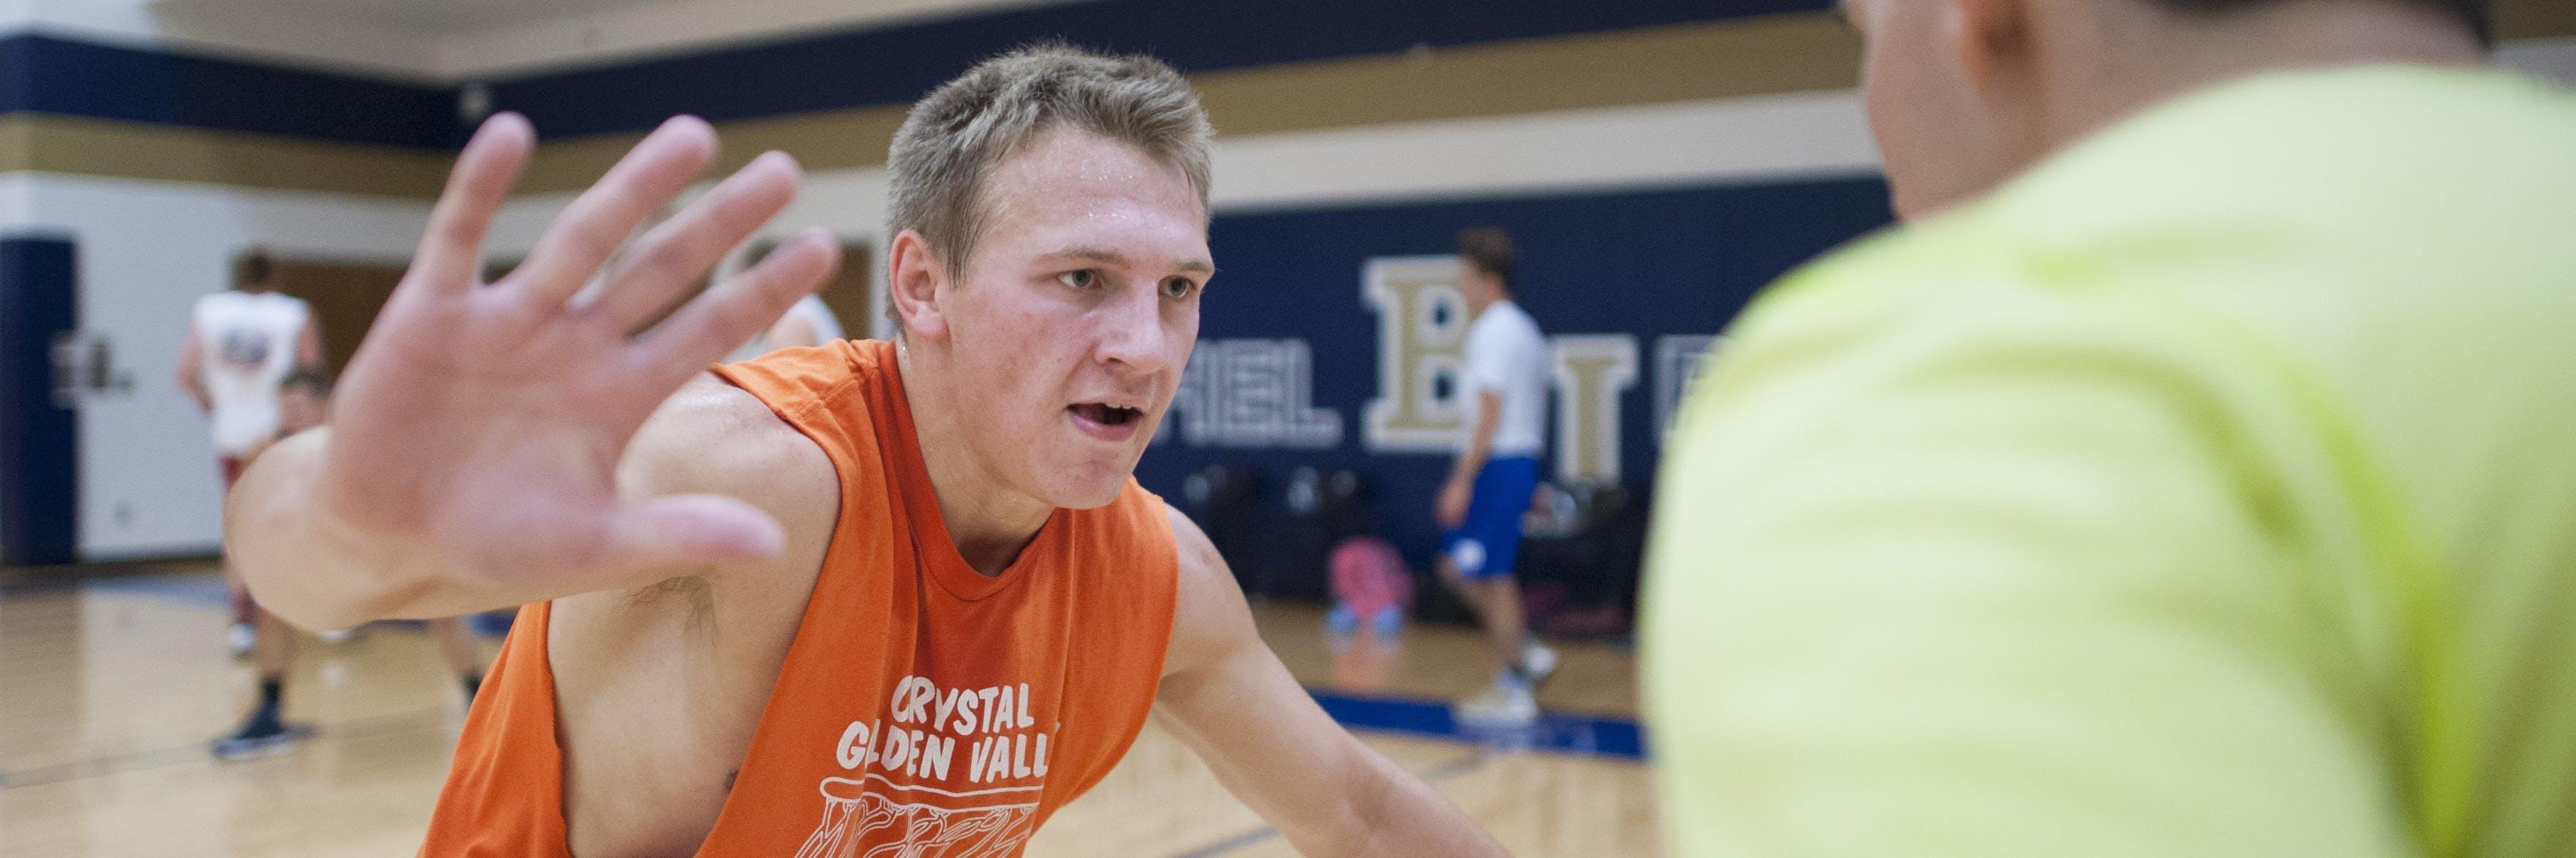 A student playing basketball